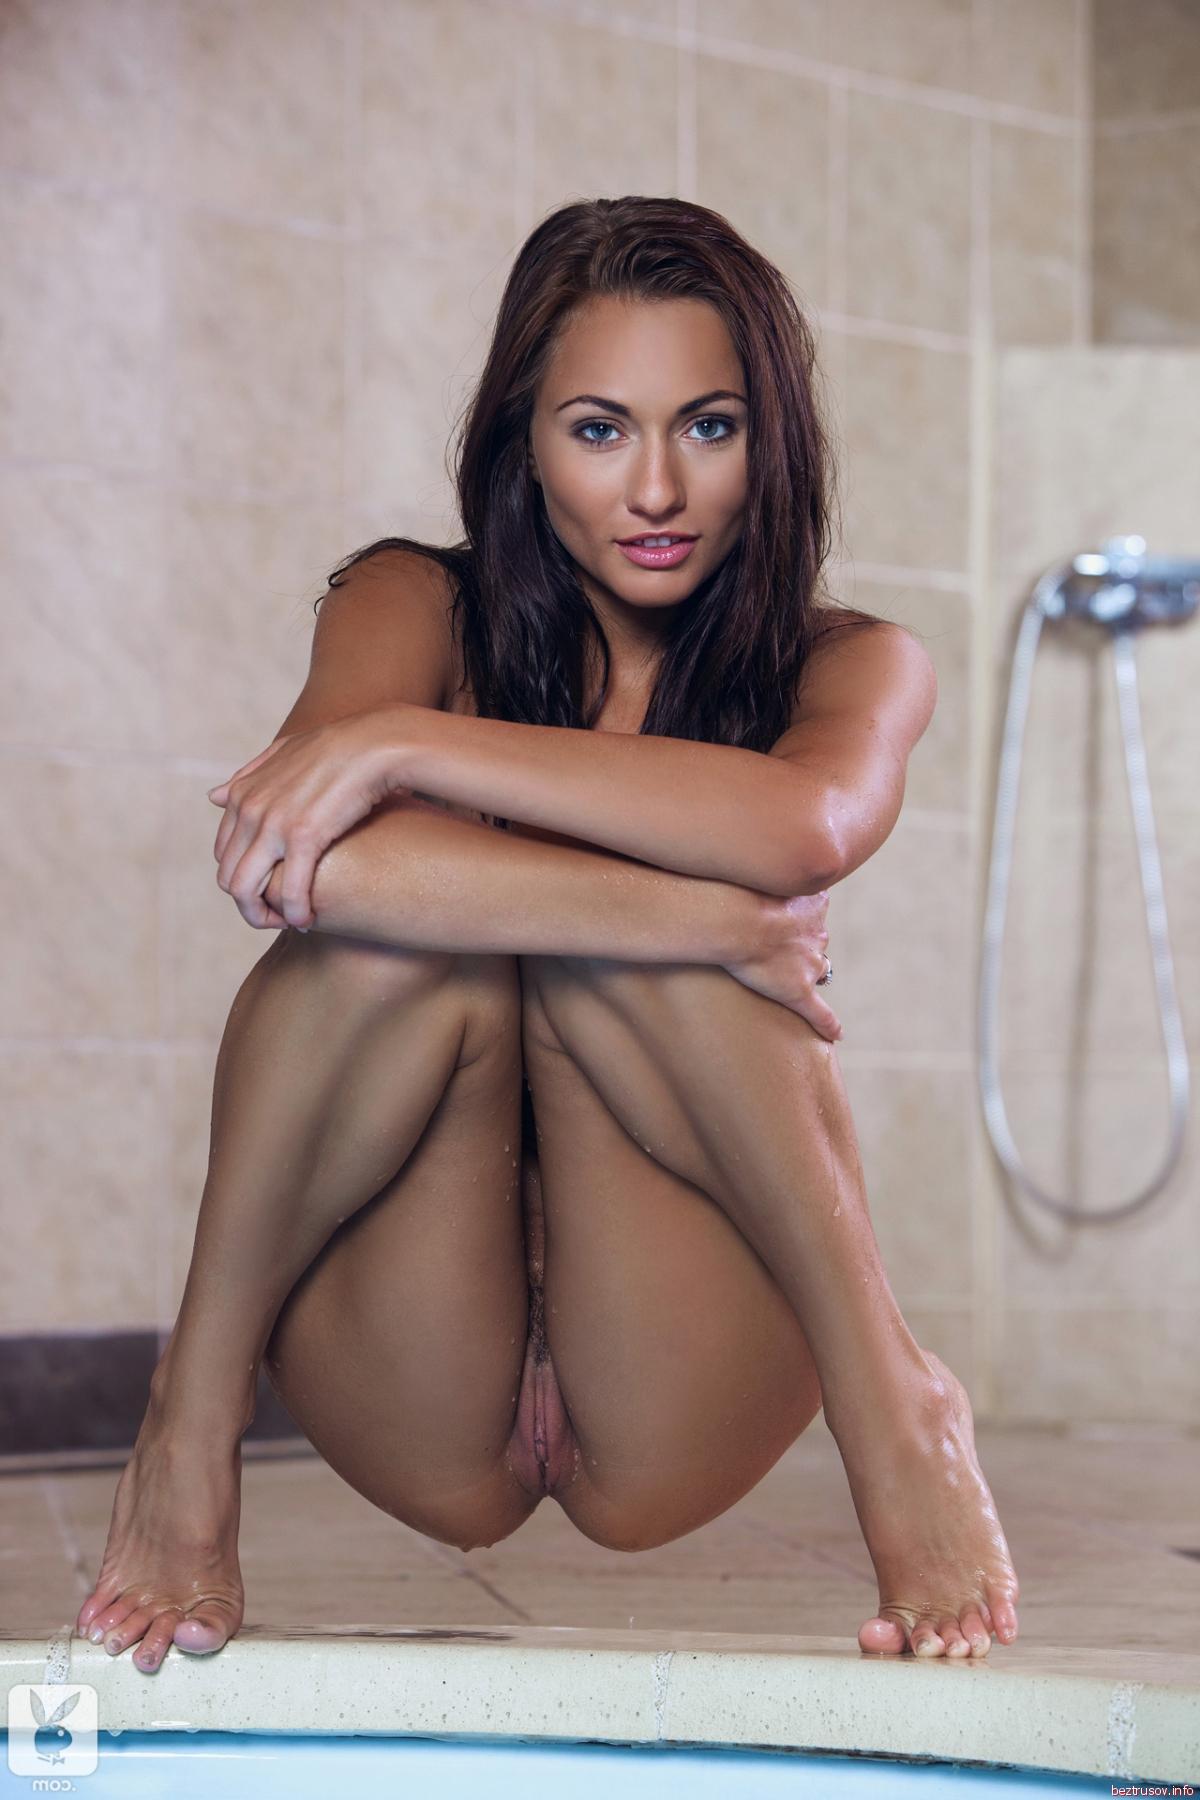 Мокрая девушка в бикини танцует у бассейна